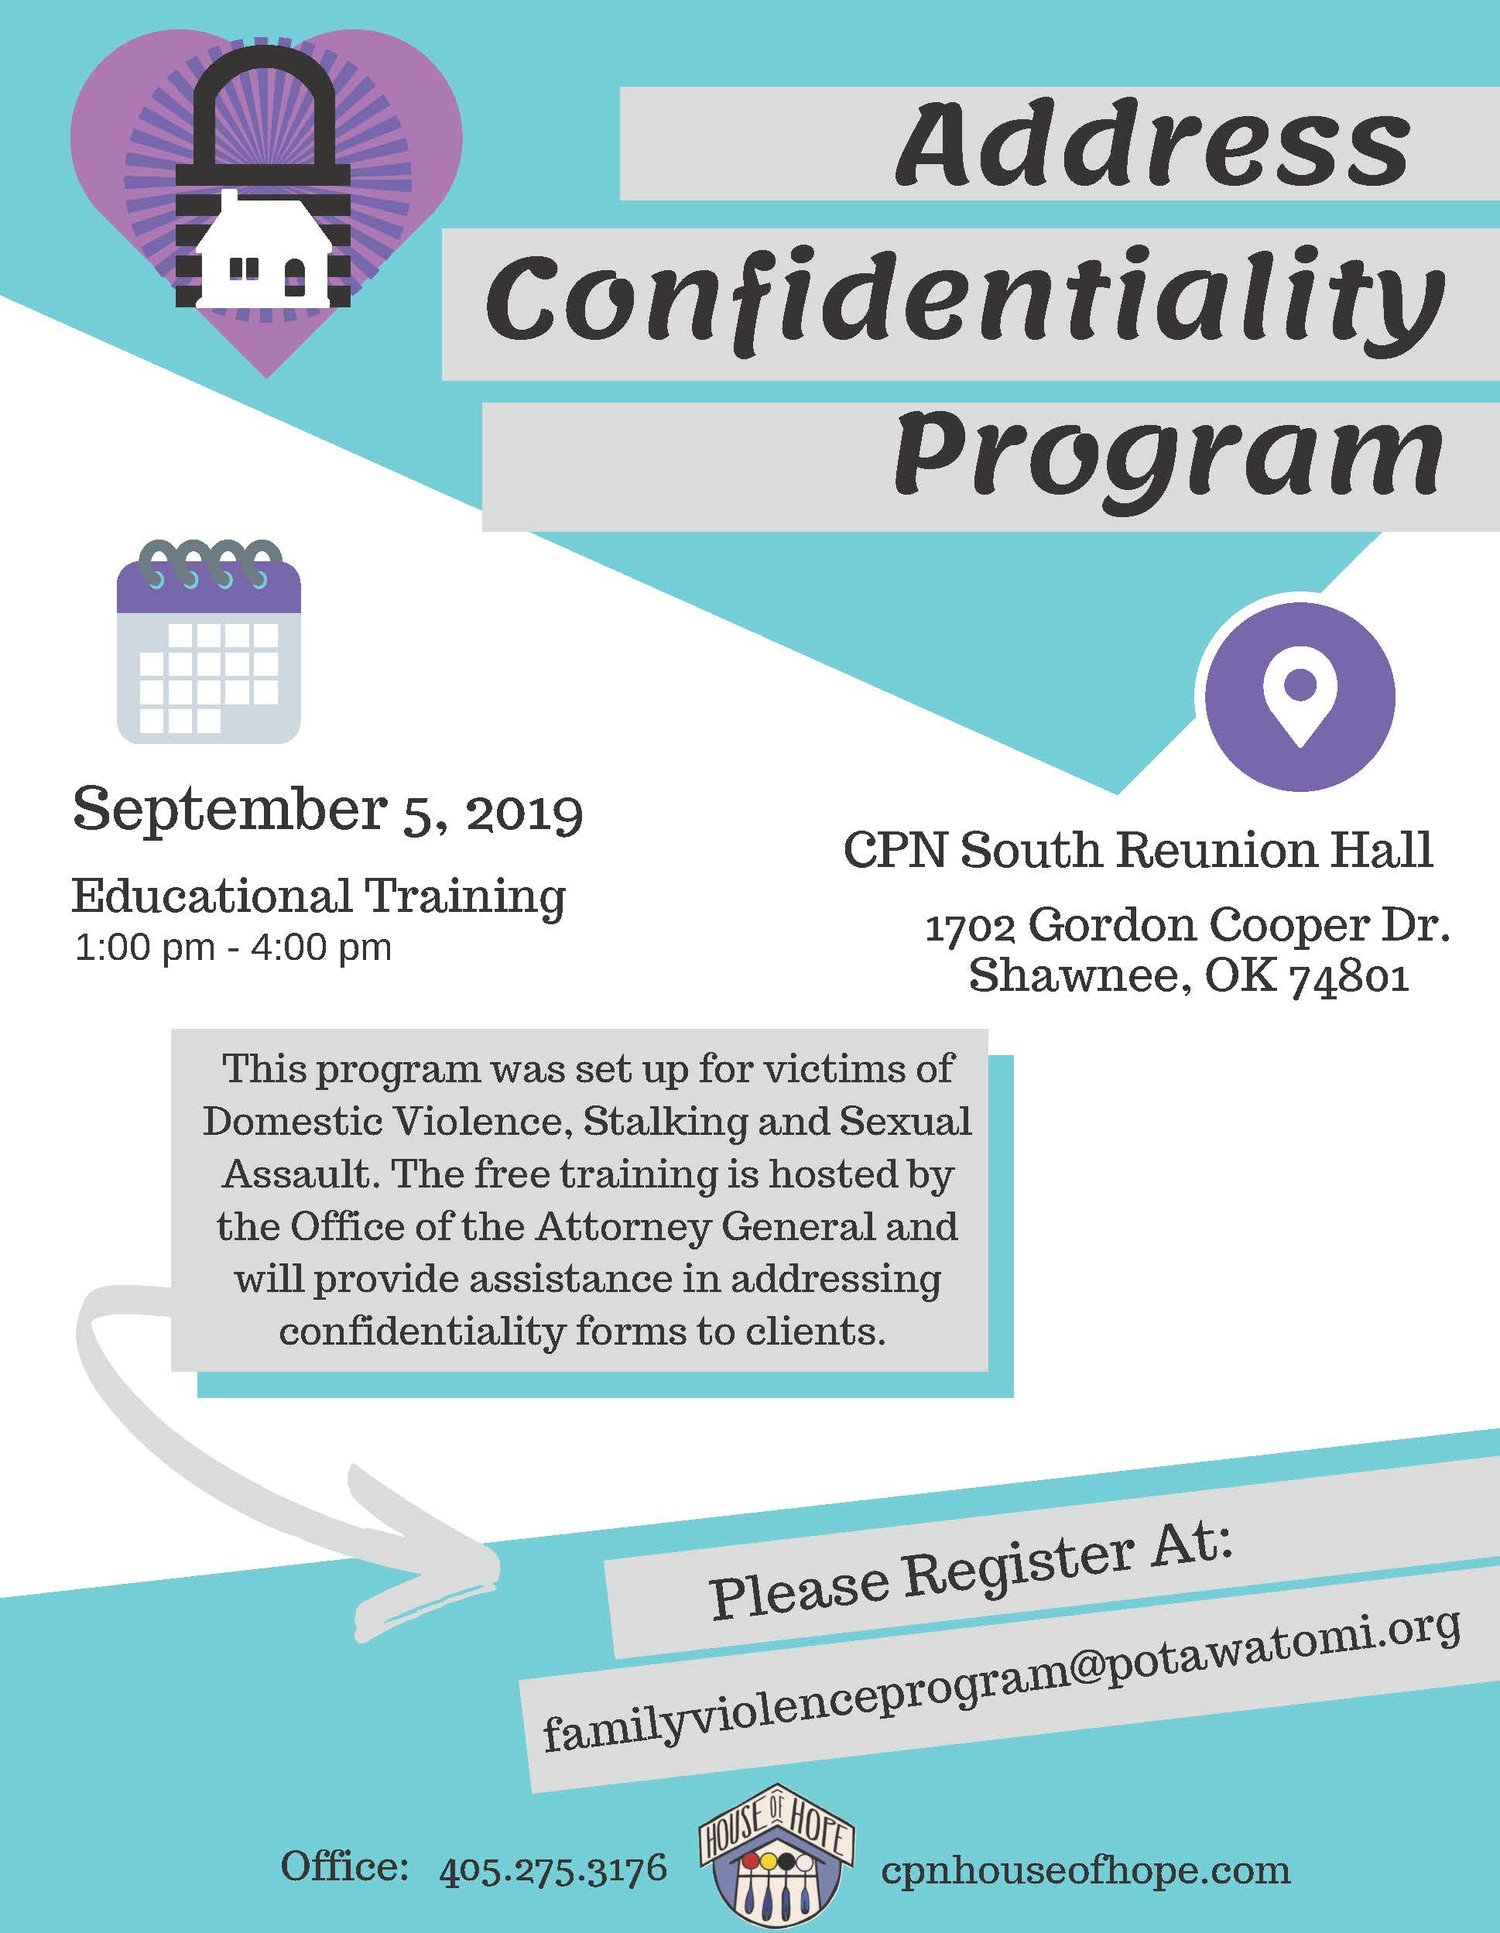 Address Confidentiality Program Training- Citizen Potawatomi